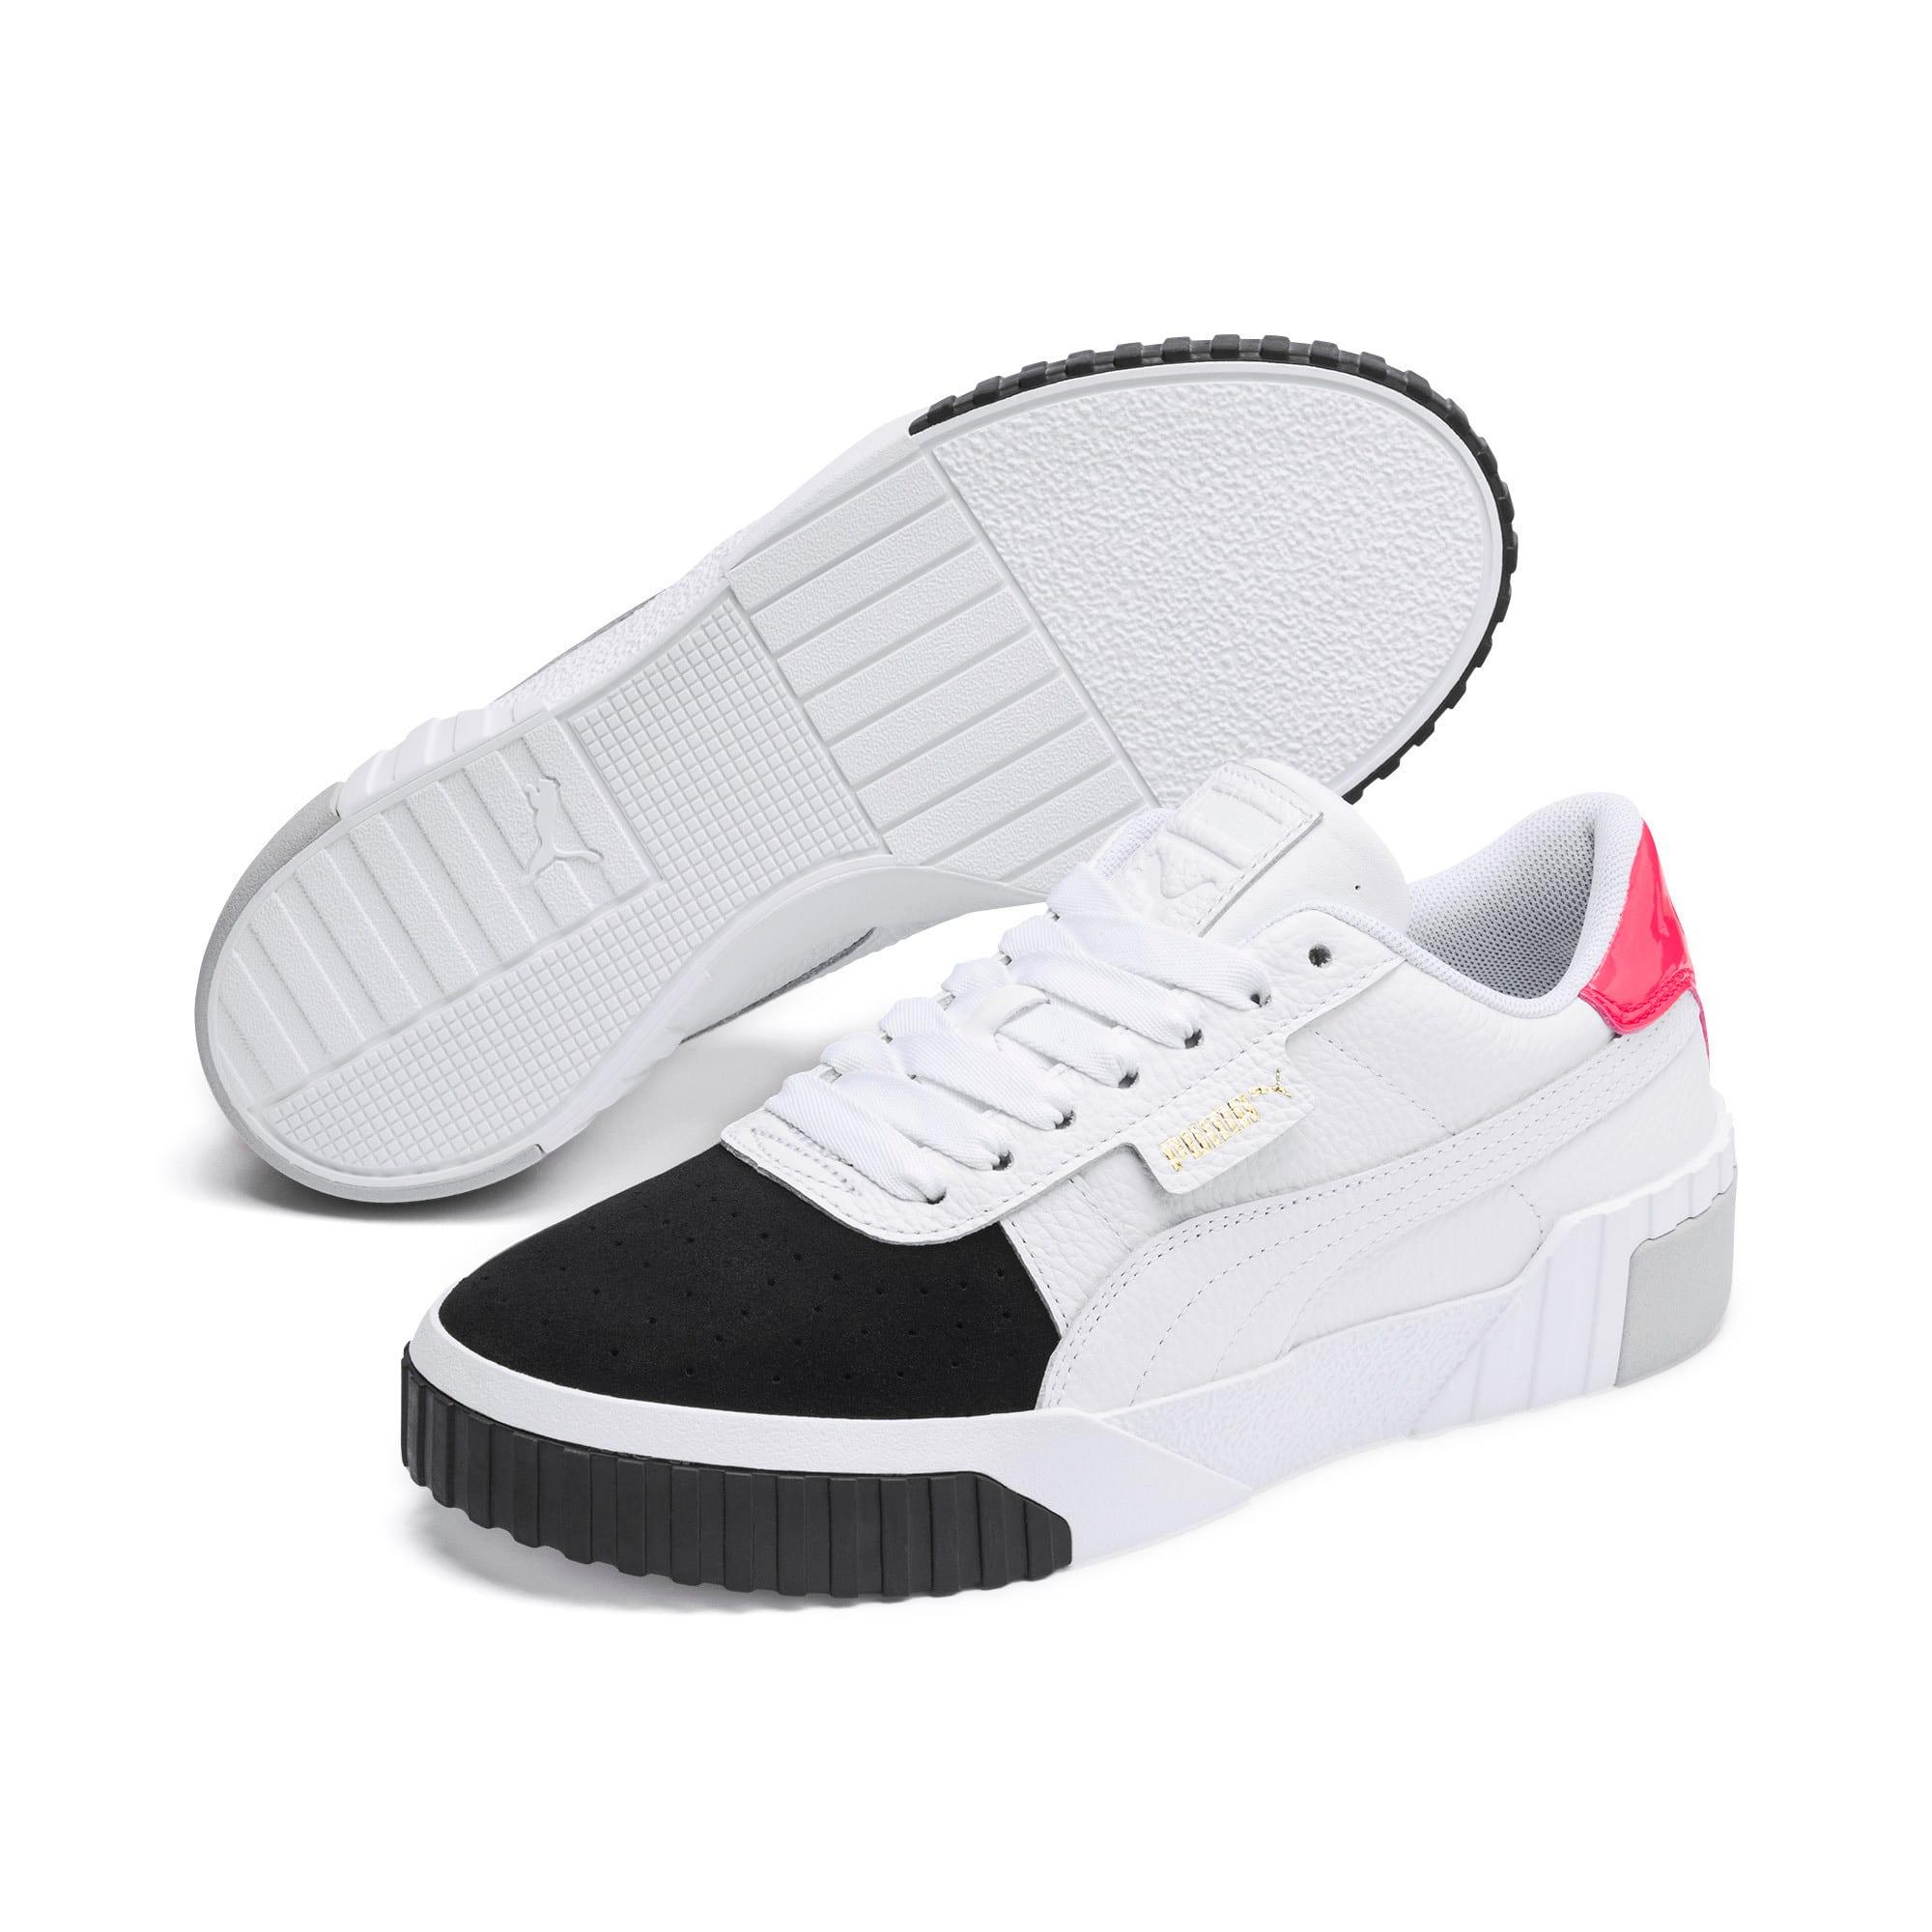 Thumbnail 3 of Cali Remix Women's Sneakers, Puma White-Puma Black, medium